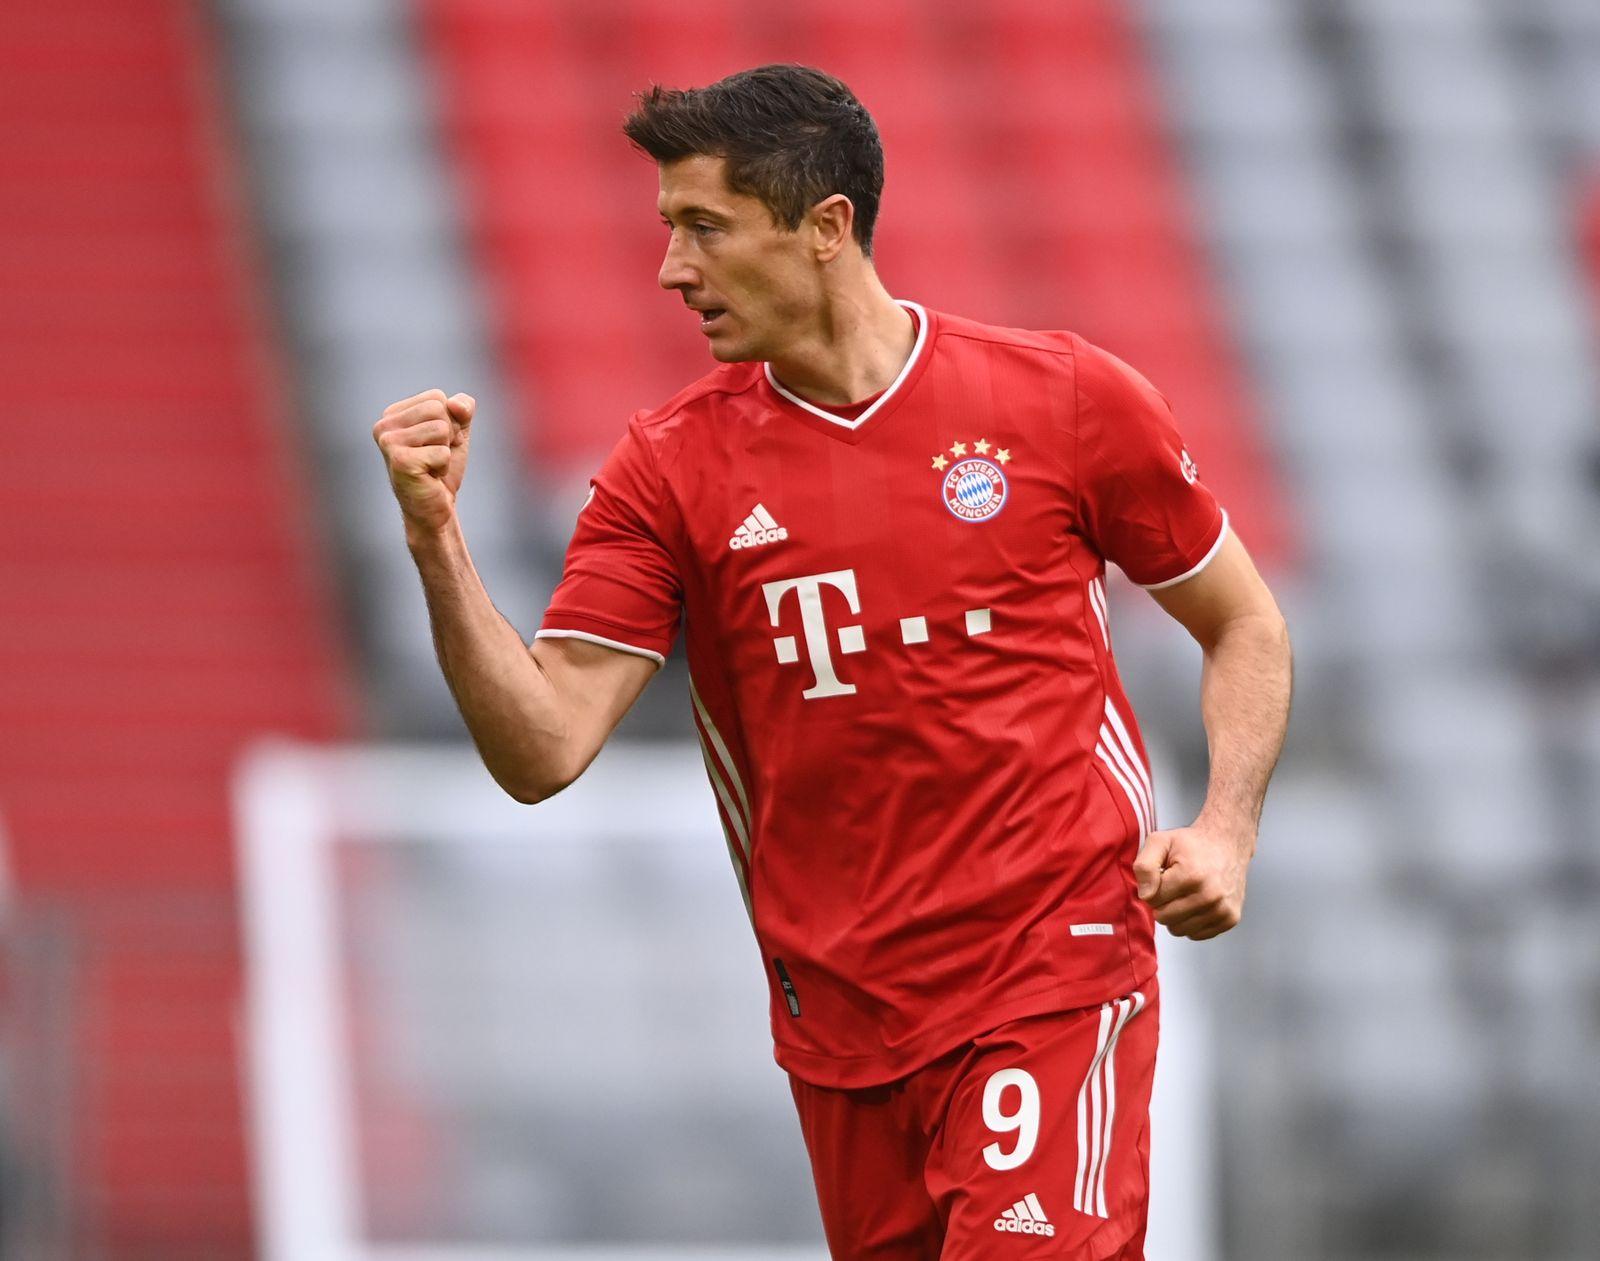 FC Bayern Munich vs. Eintracht Frankfurt, Germany - 24 Oct 2020